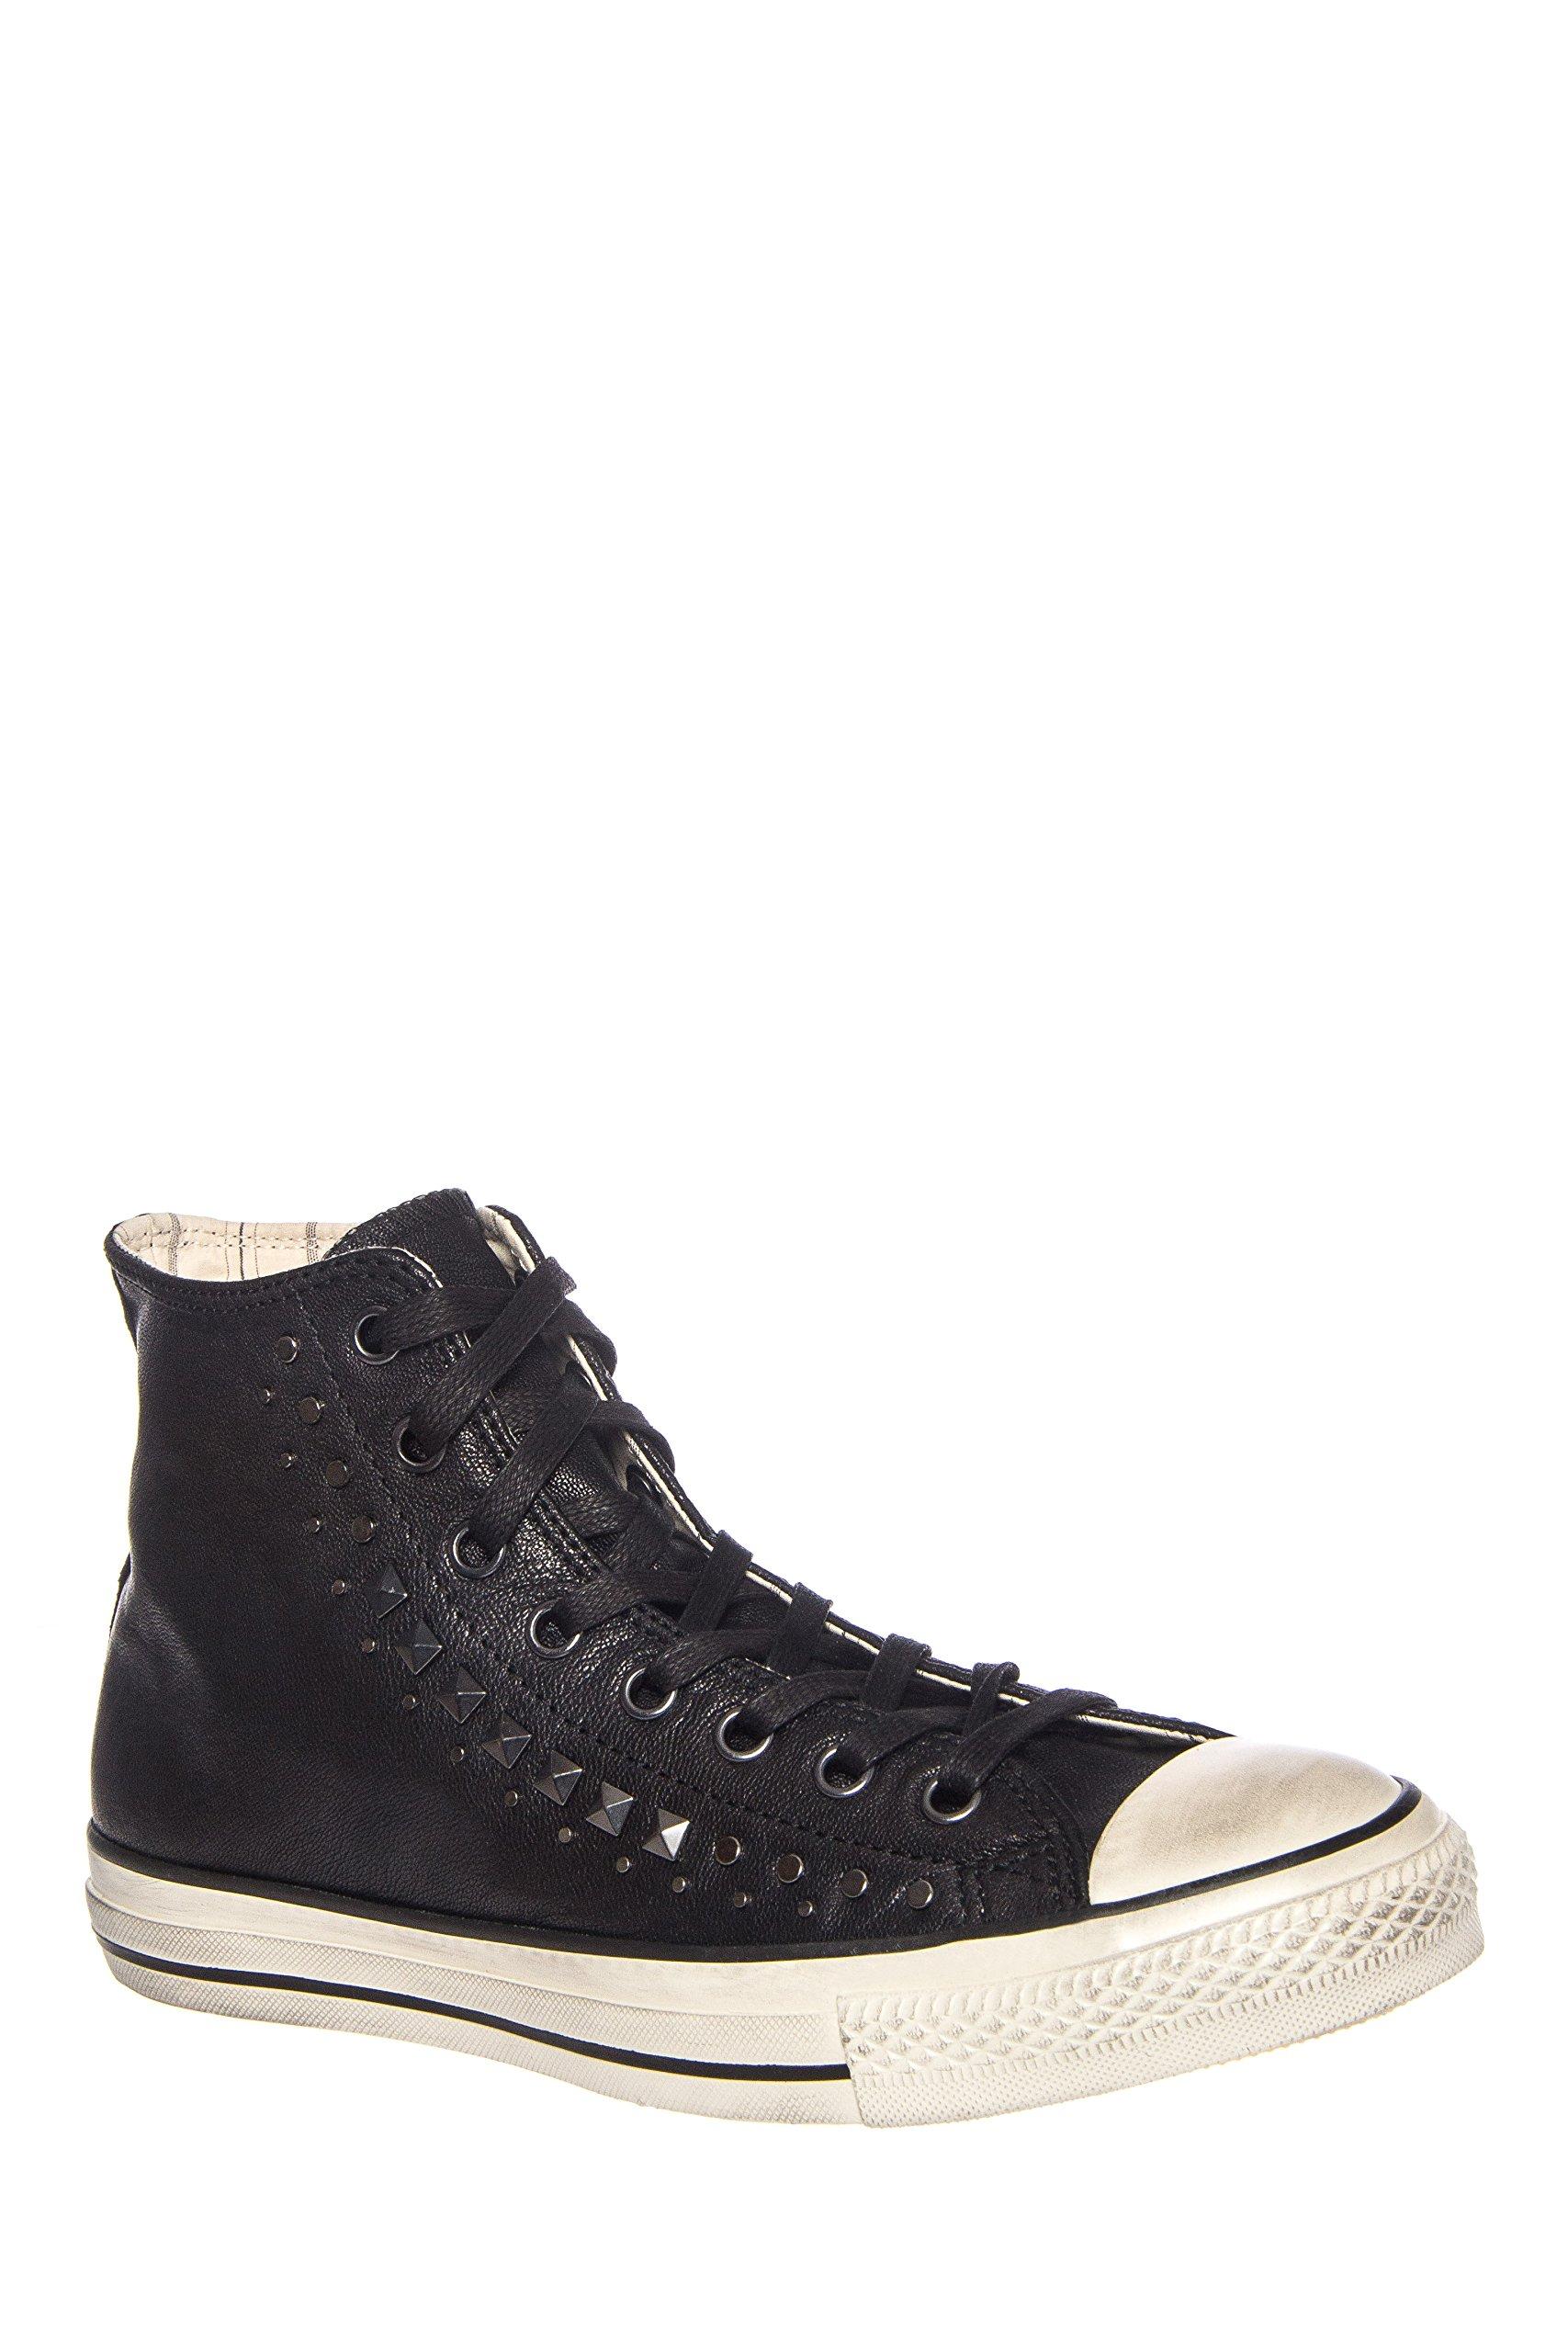 Converse By John Varvatos Men's CT HI Studded Leather Sneaker (11)